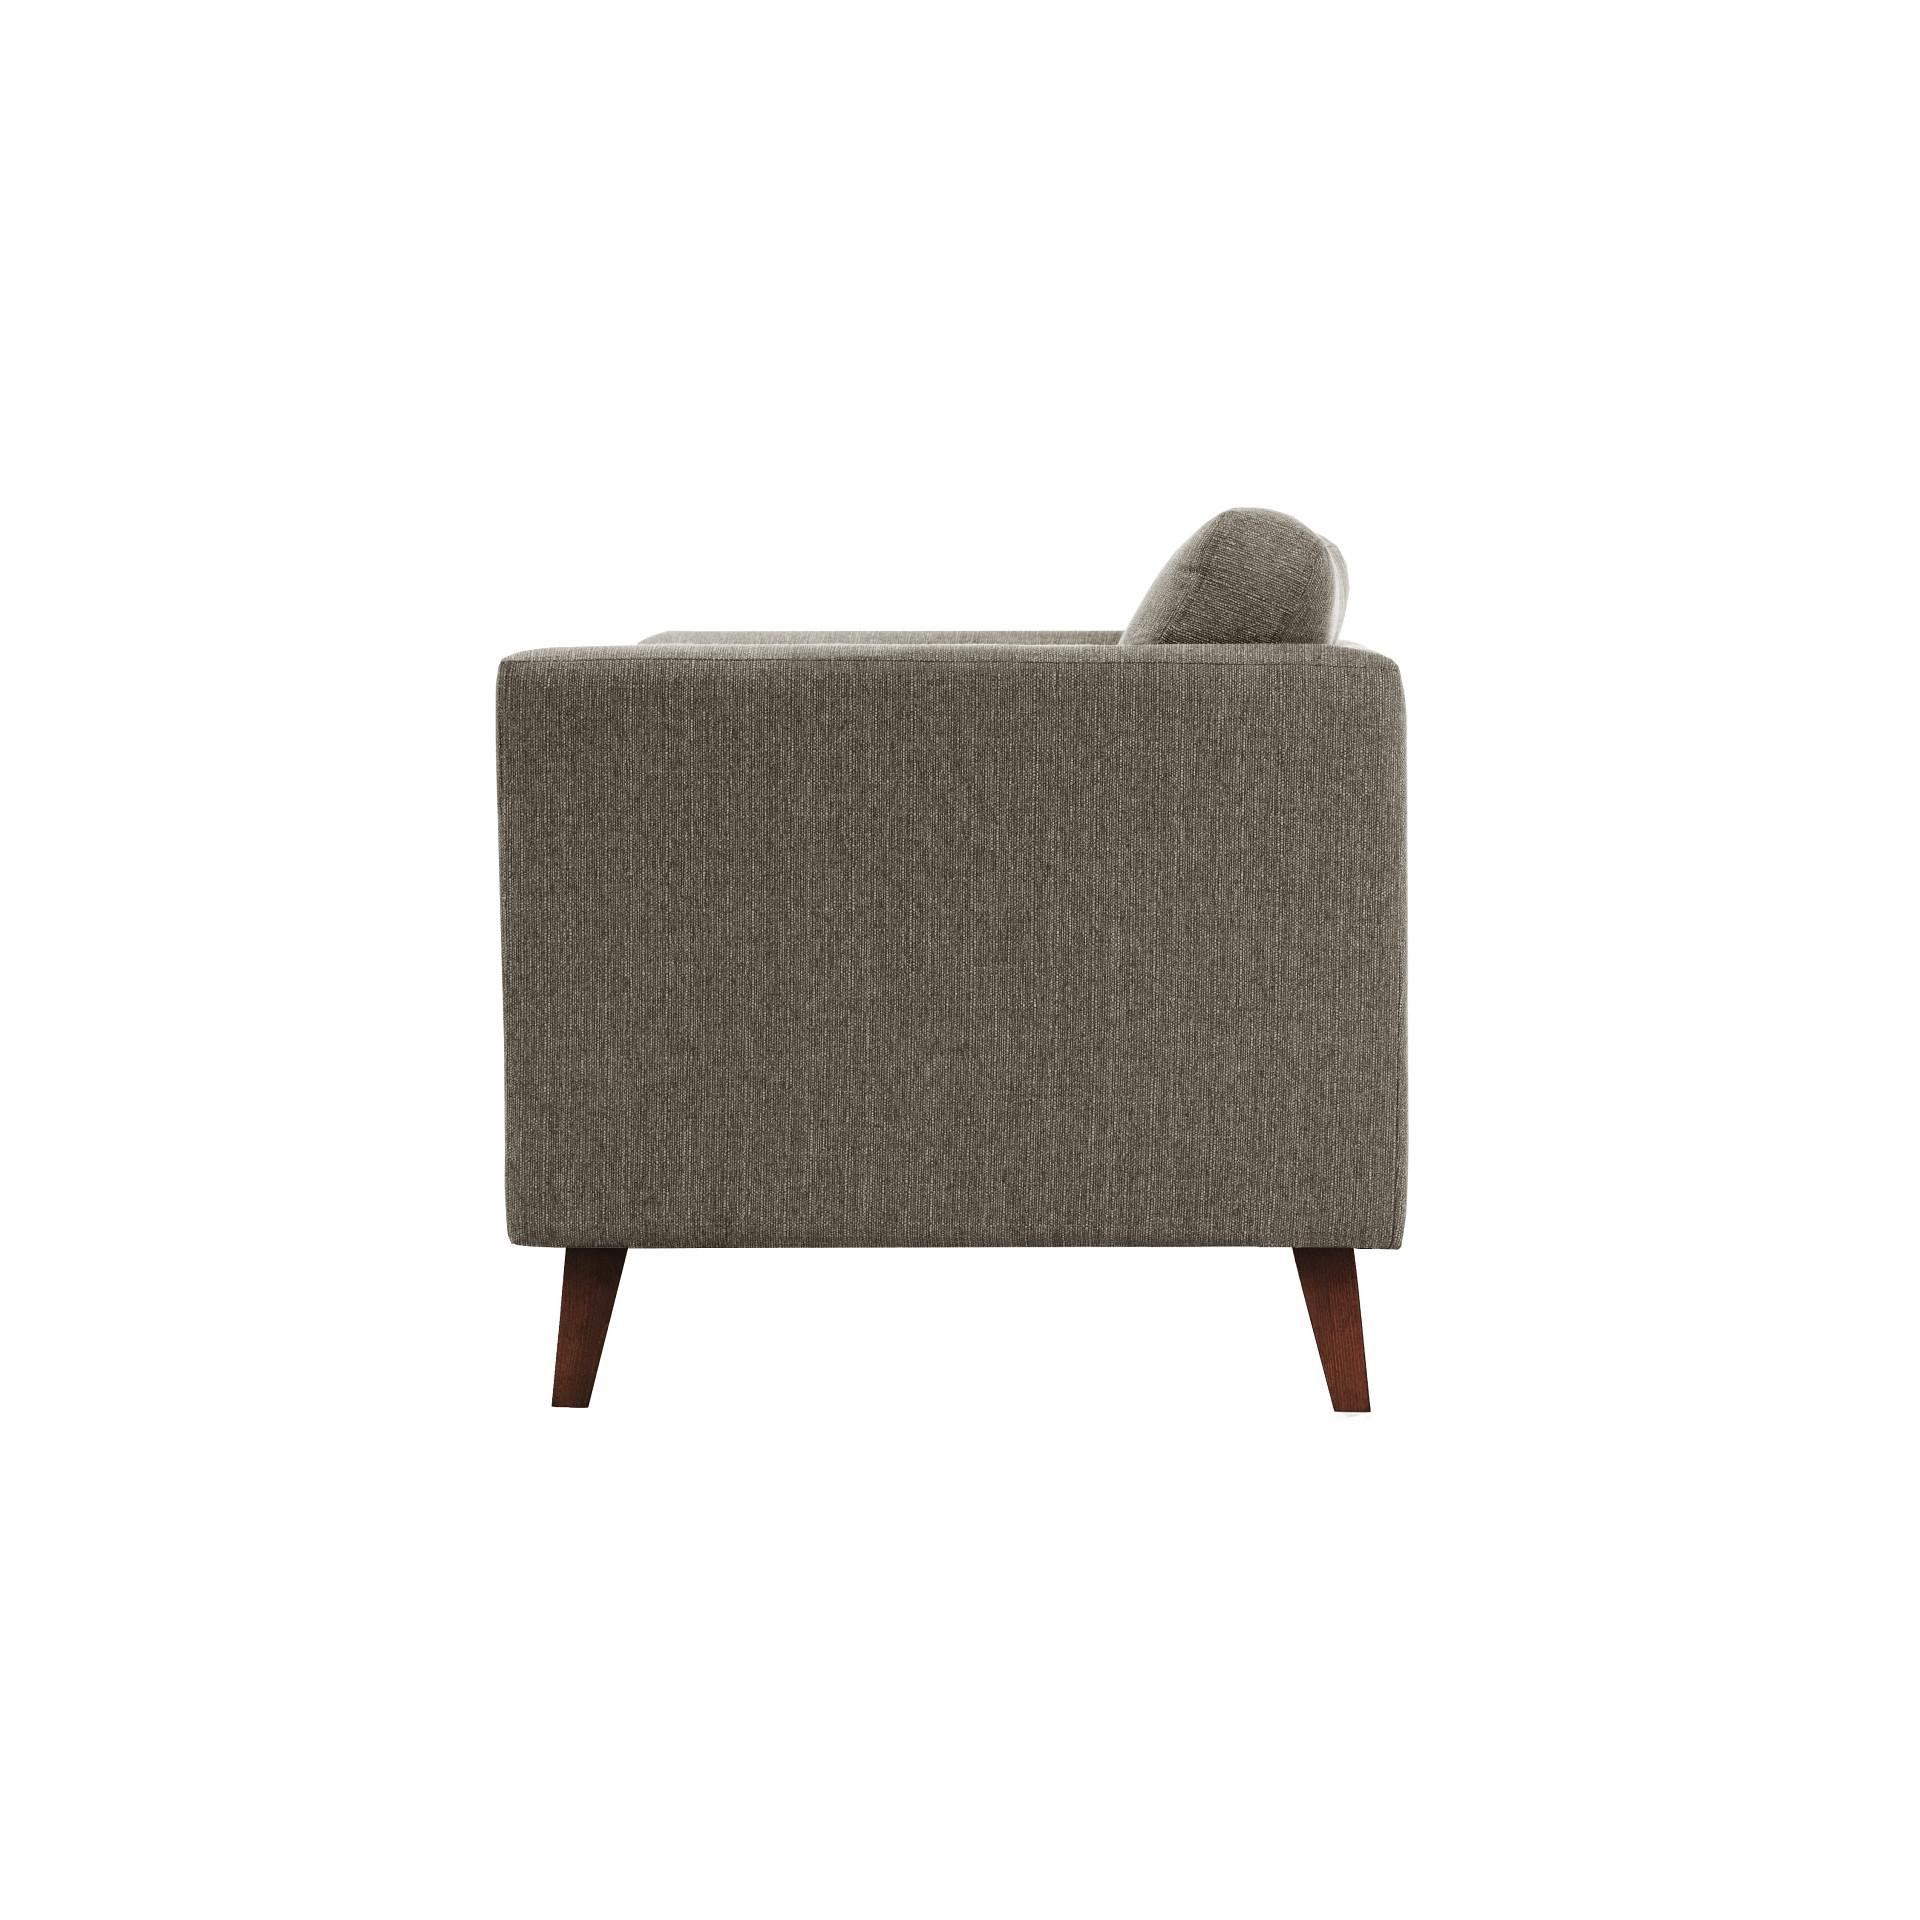 2-Sitzer Sofa Elisa   Noisette